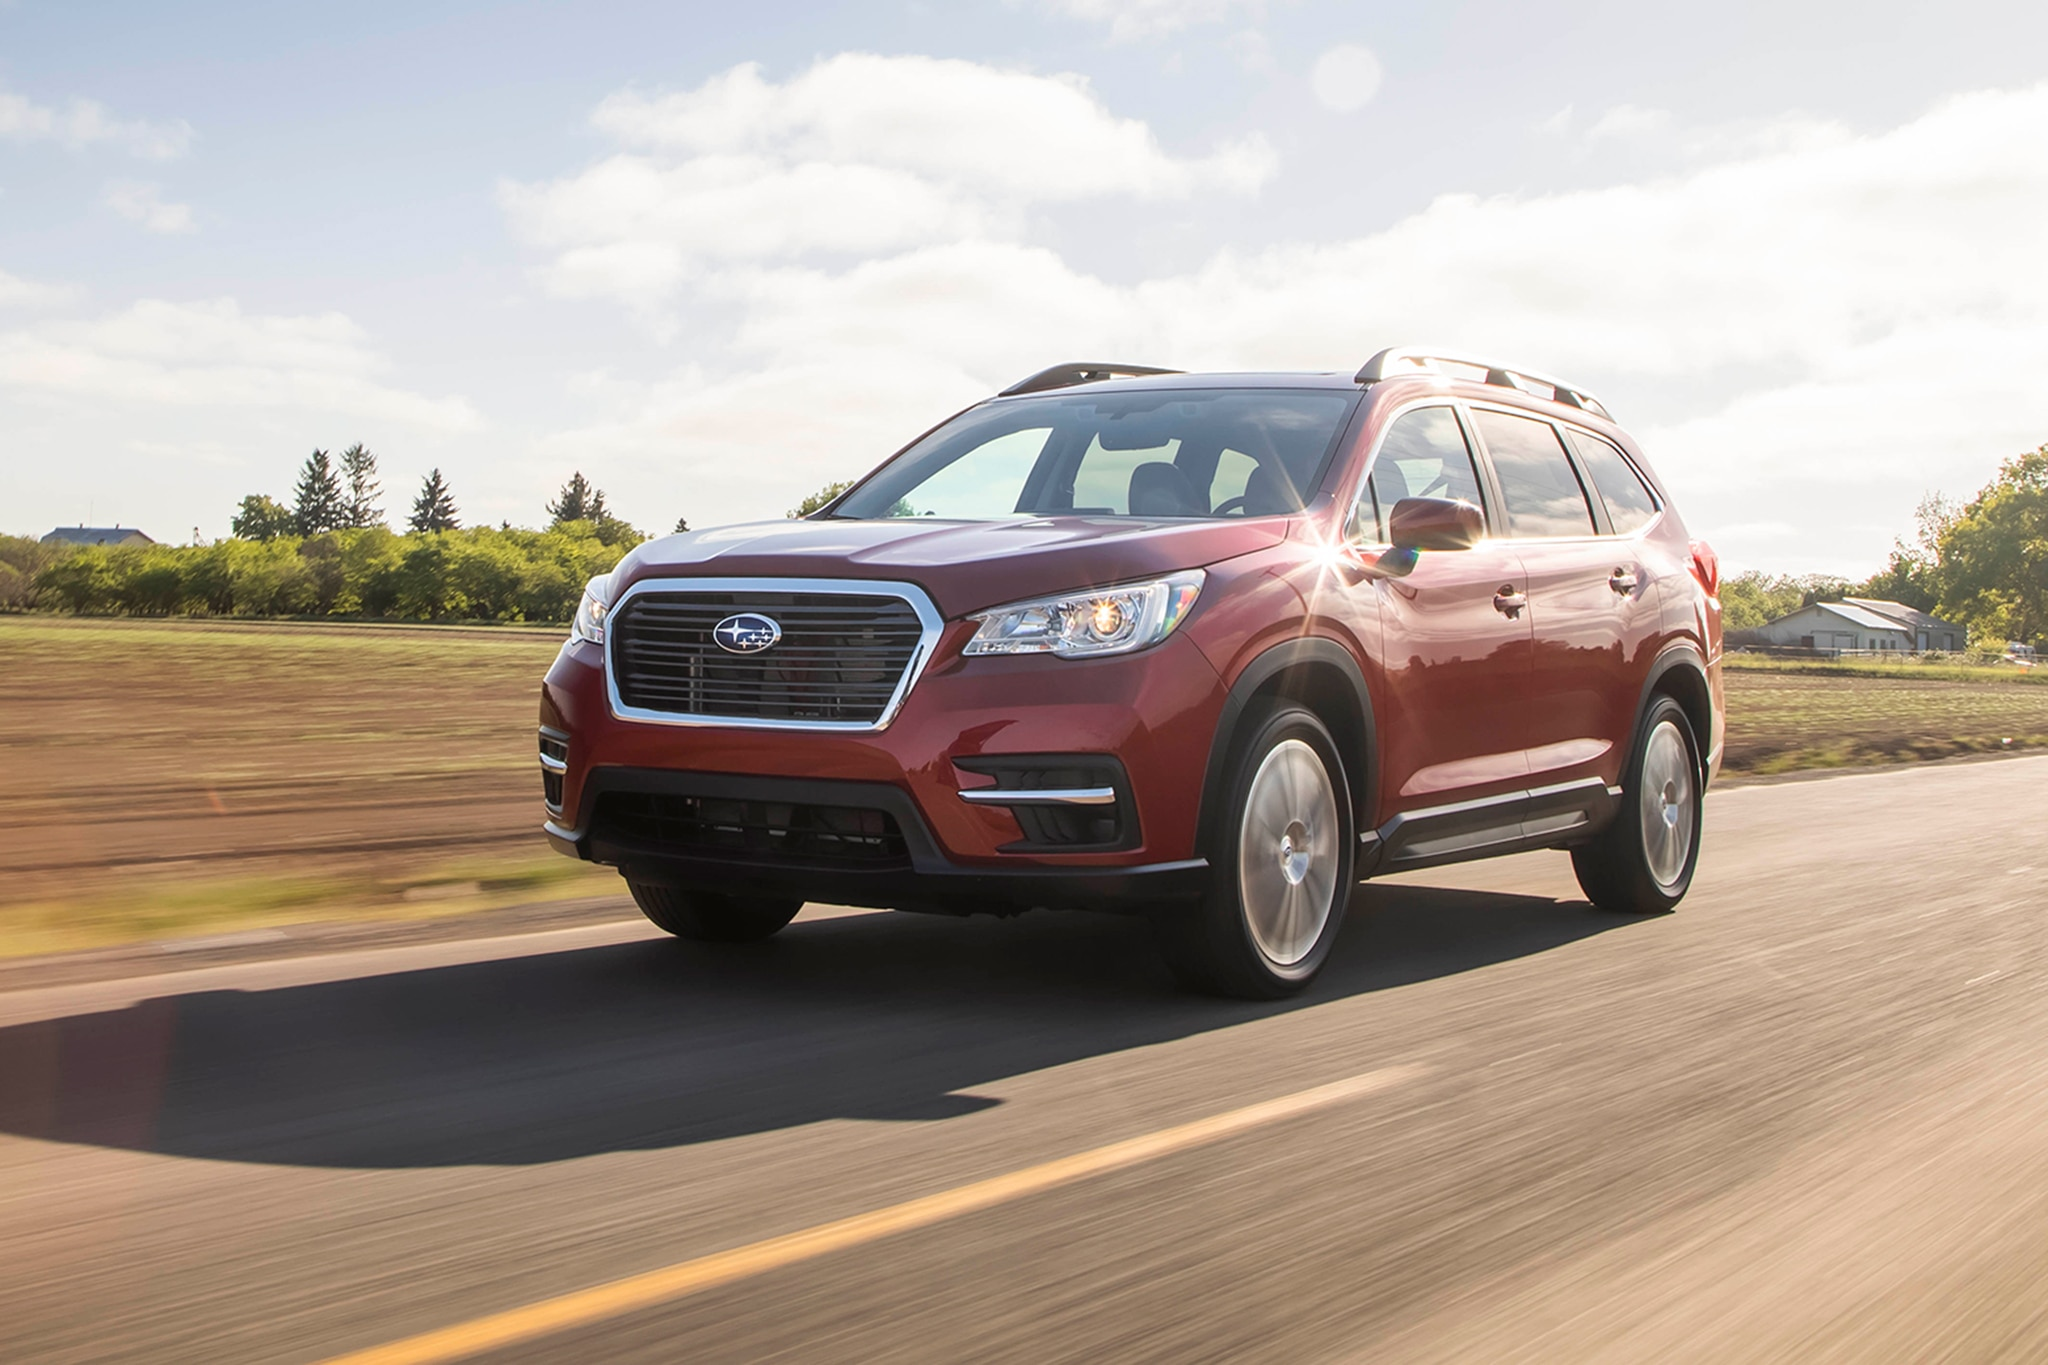 Subaru Ascent Mpg >> 2019 Subaru Ascent First Drive Review | Automobile Magazine